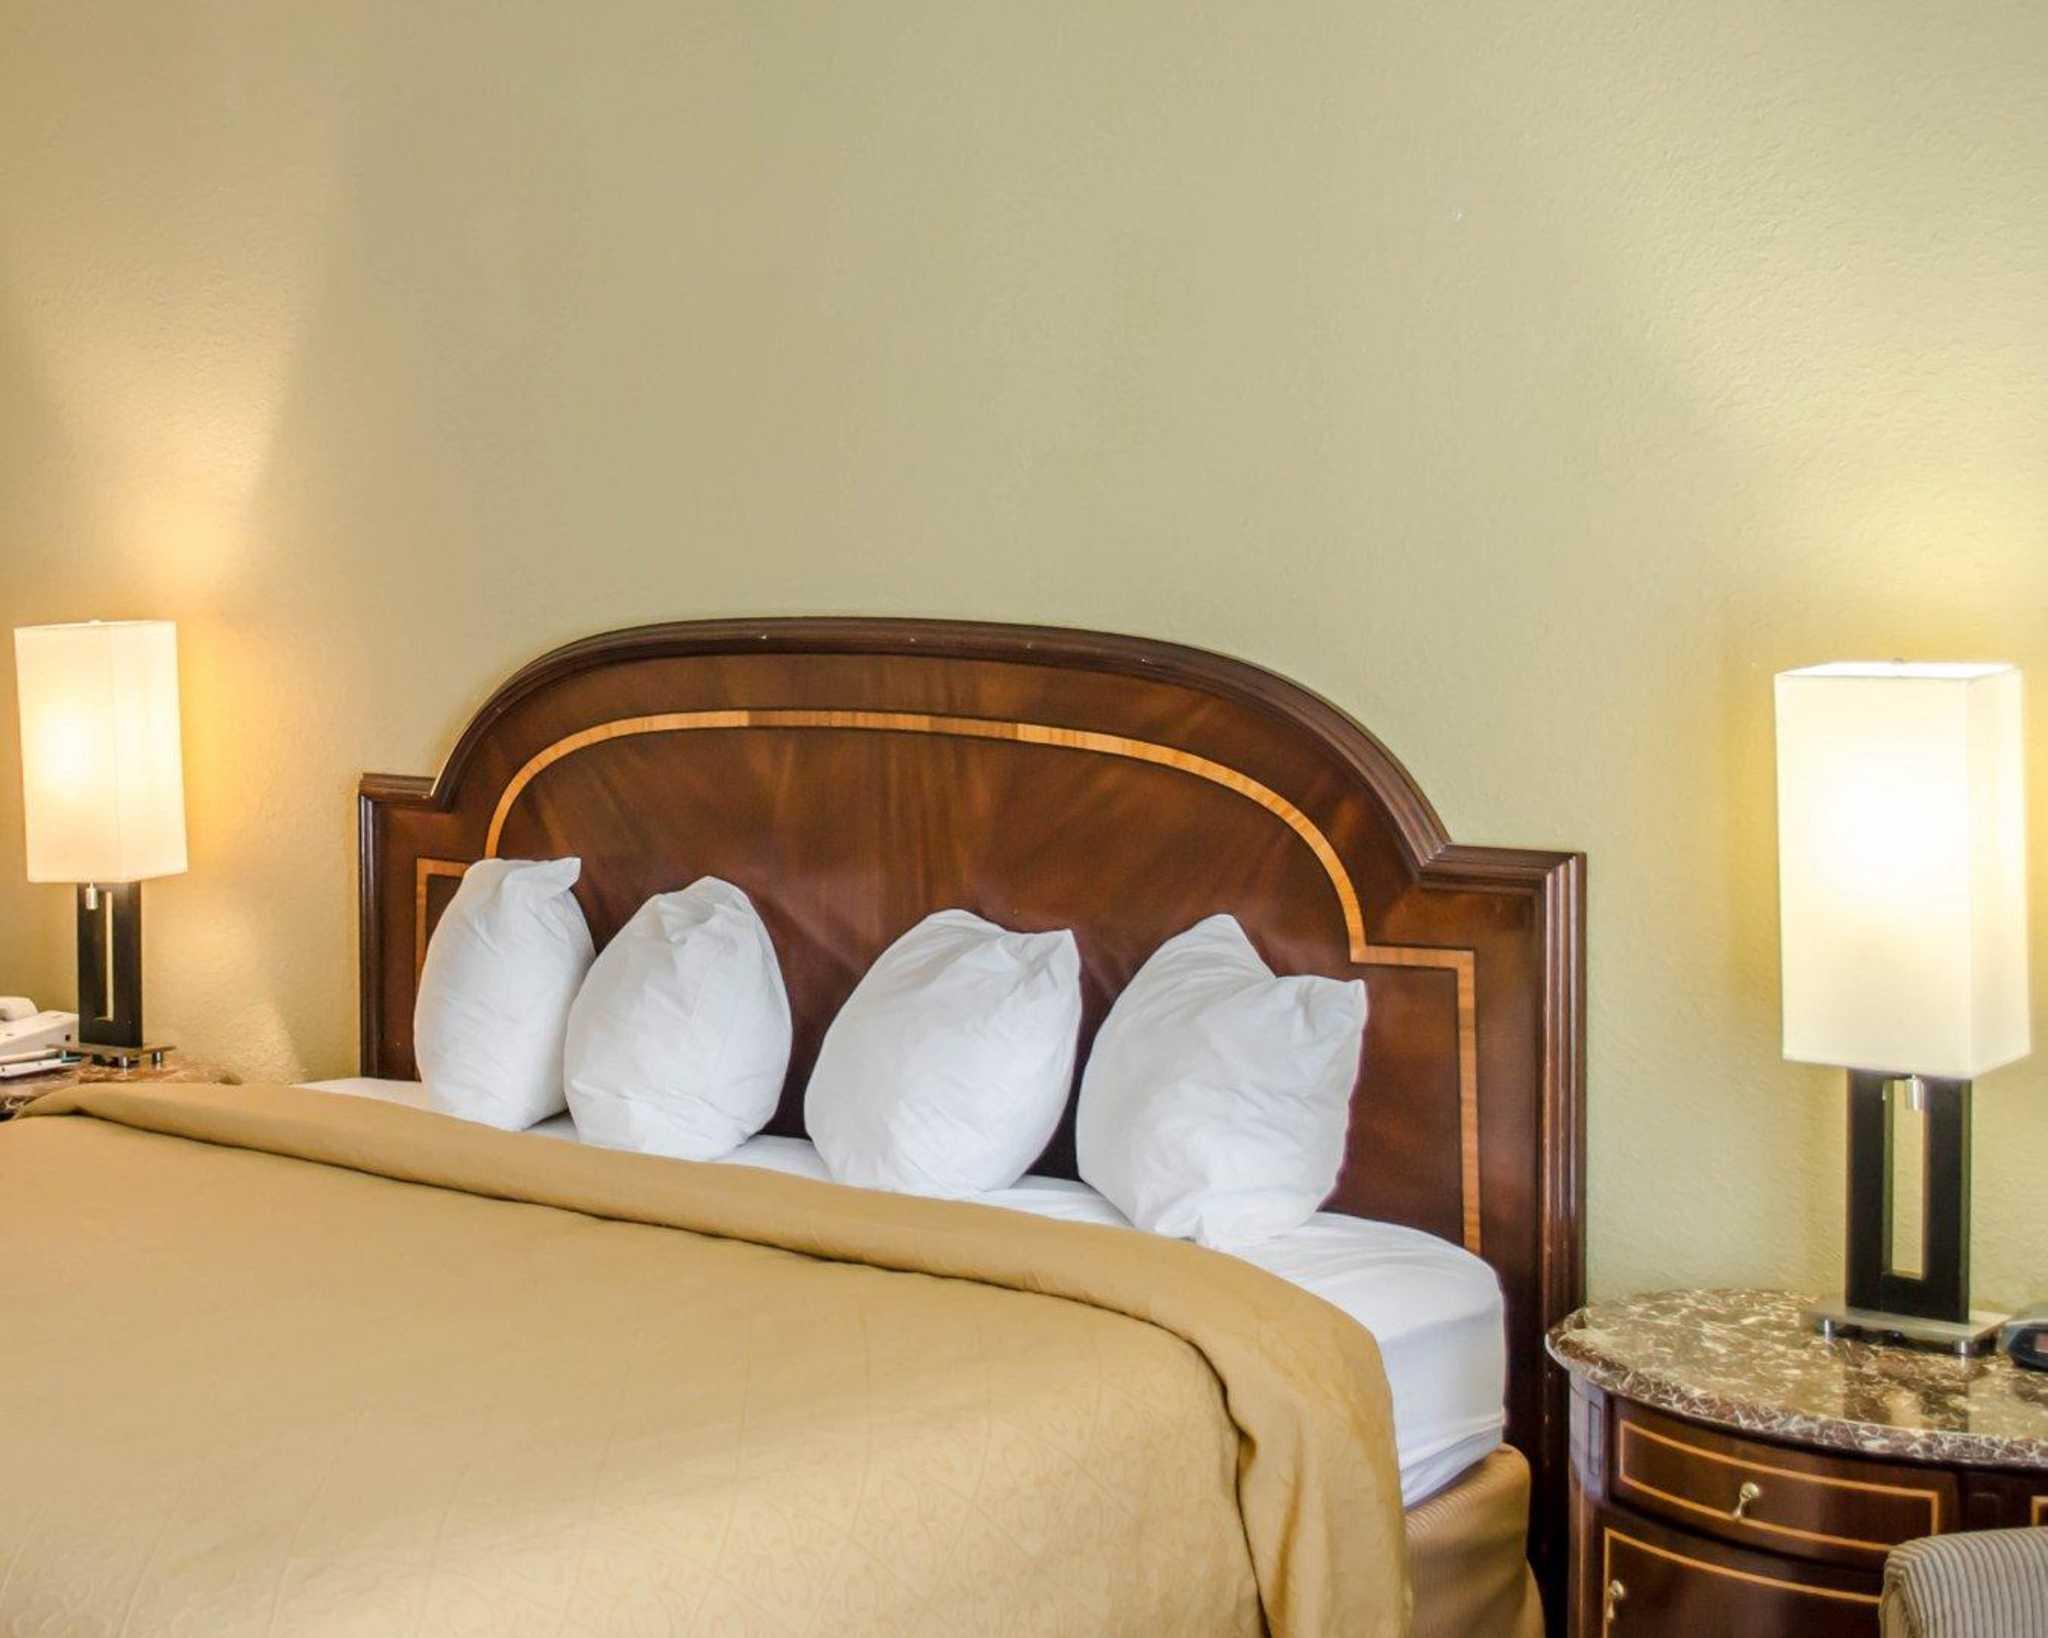 Quality Inn & Suites Pensacola Bayview in Pensacola, FL, photo #27